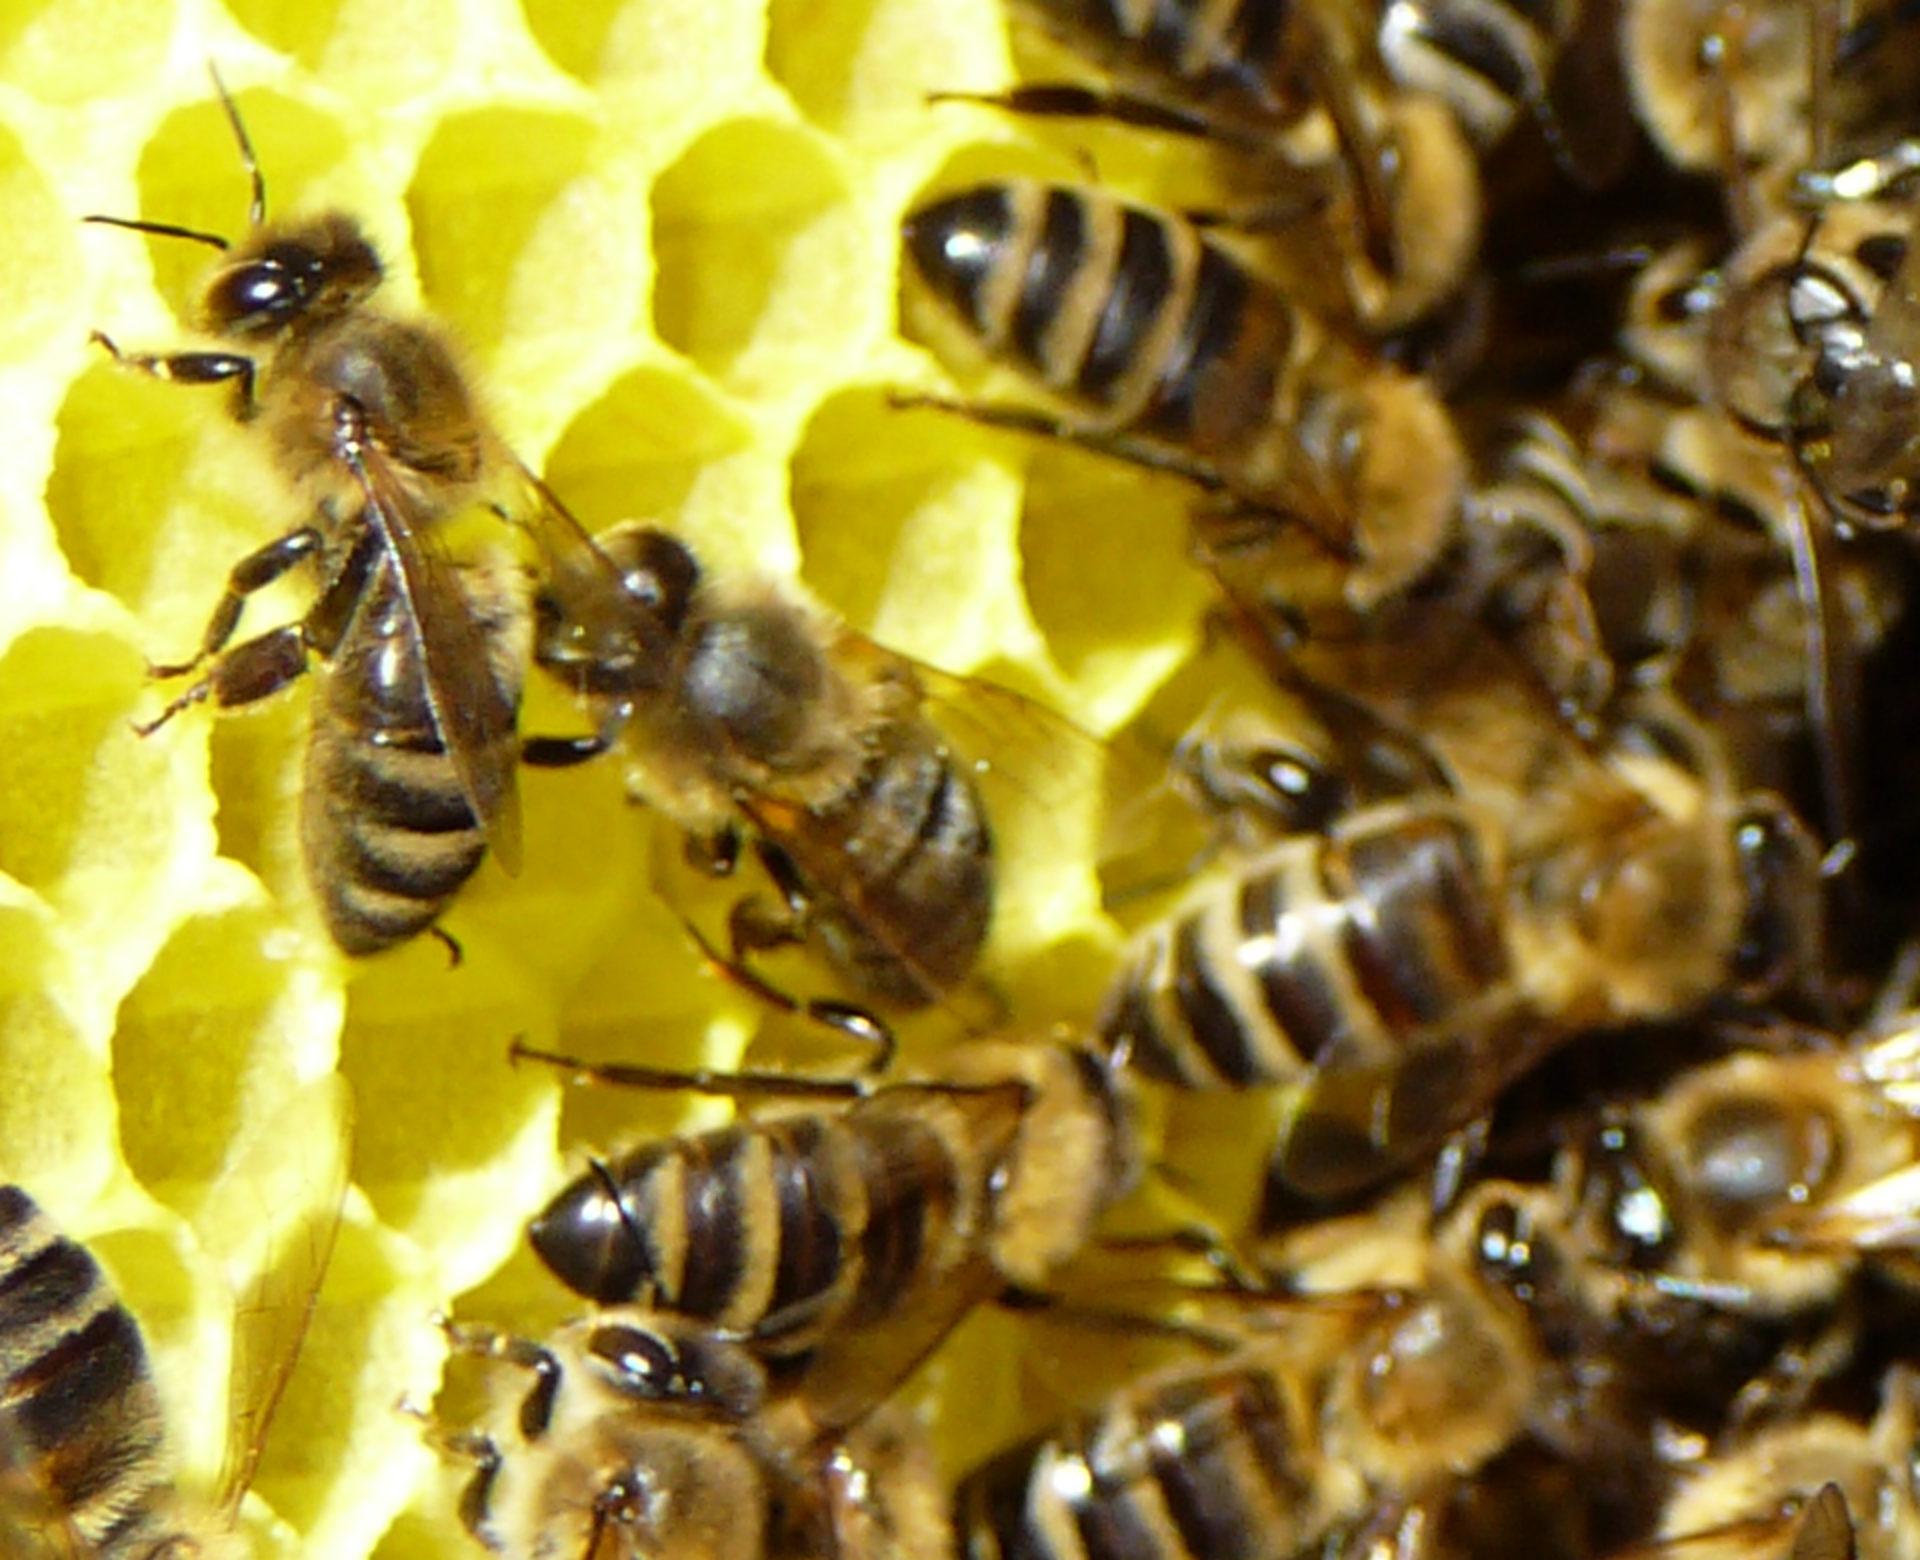 Prodej vyzimovaných včelstev 2018